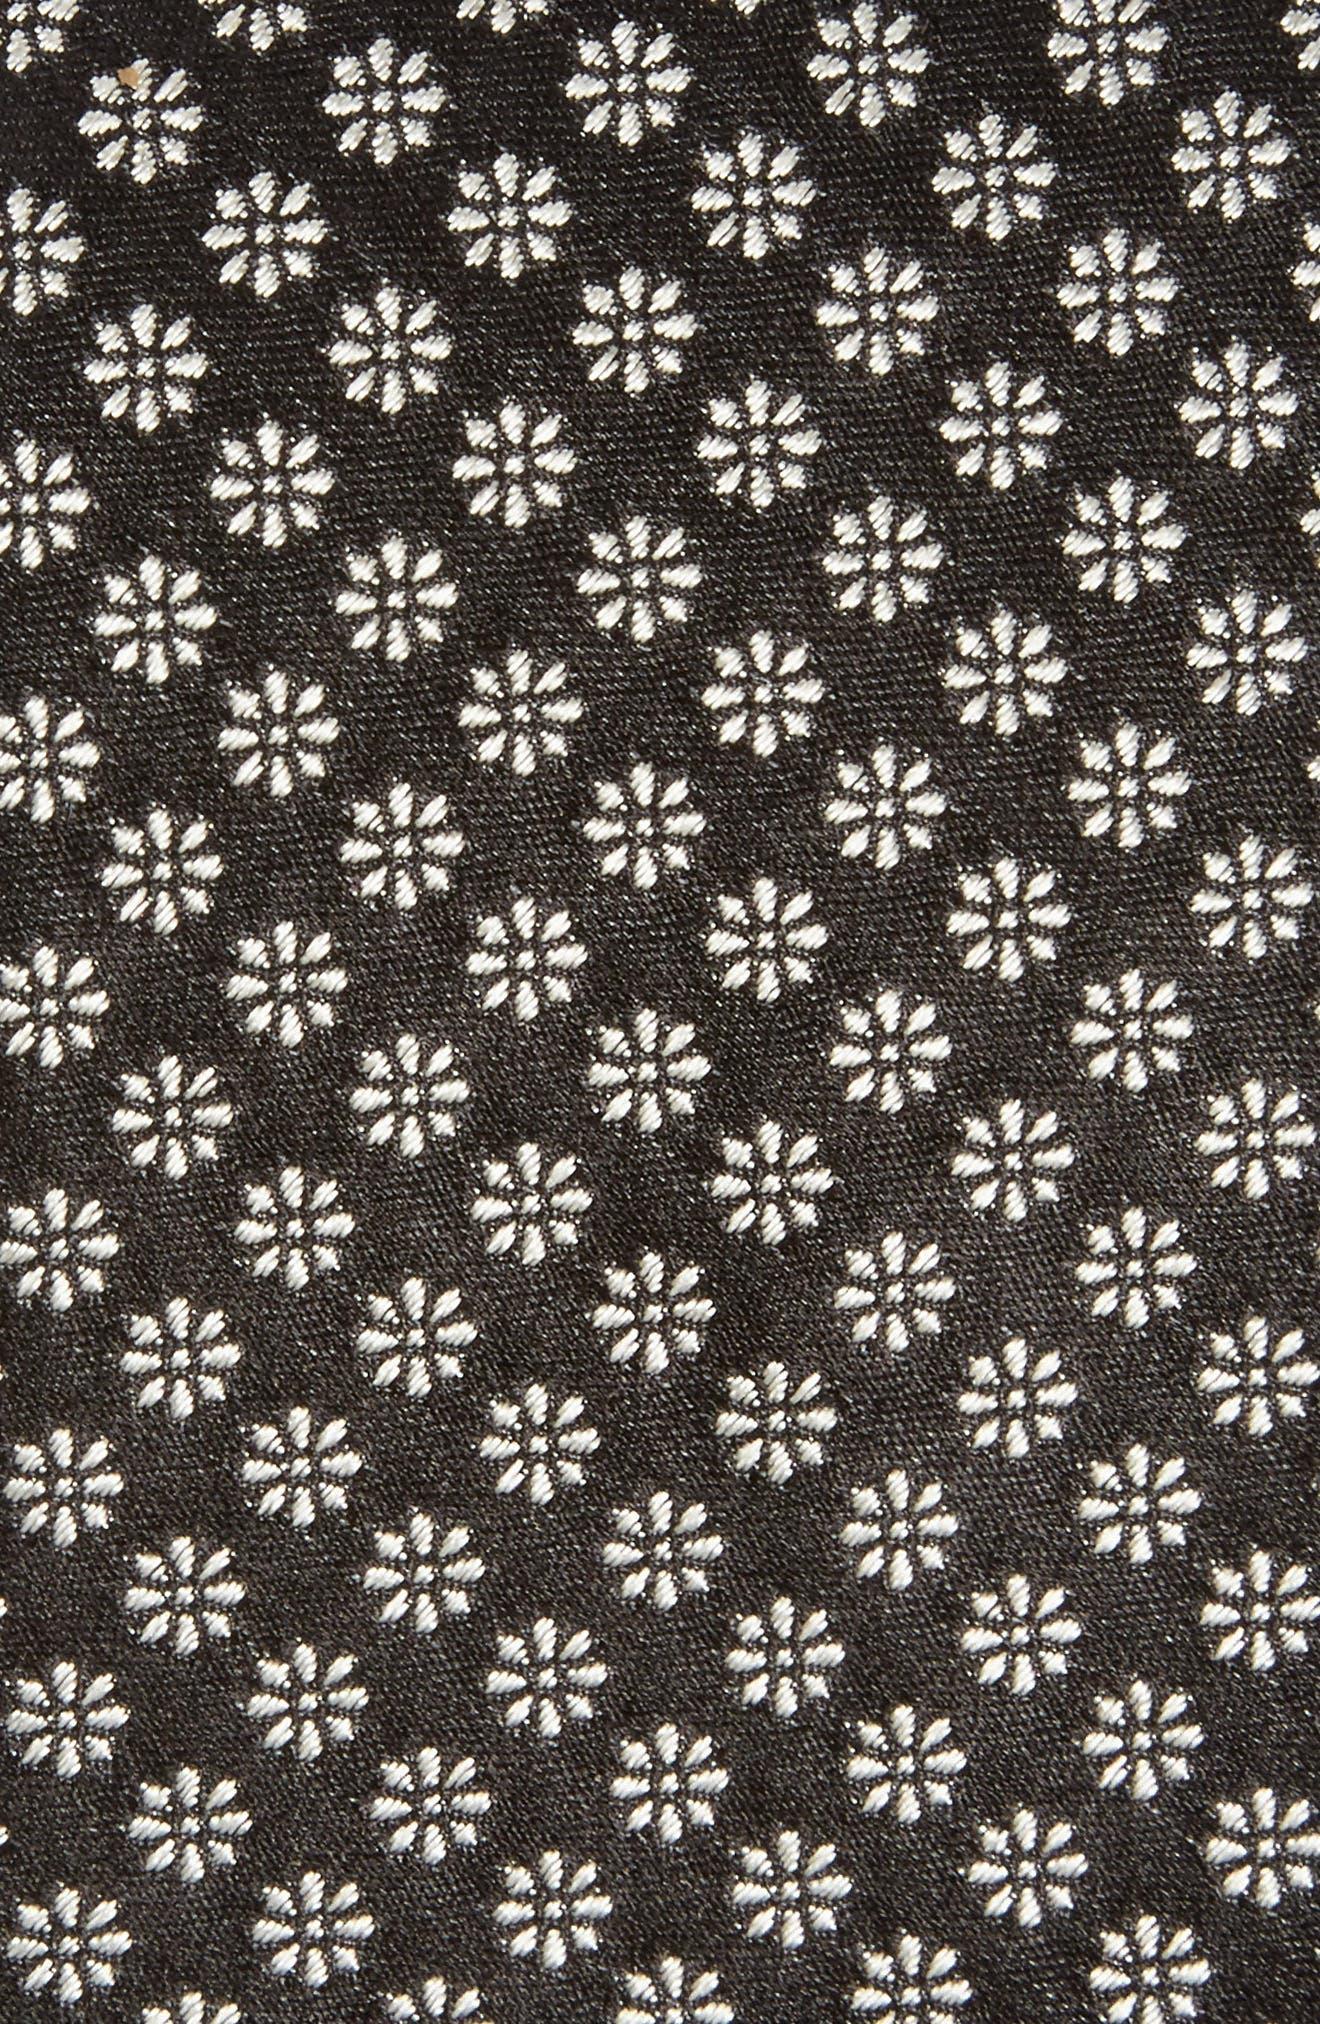 Floral Silk Skinny Tie,                             Alternate thumbnail 2, color,                             415